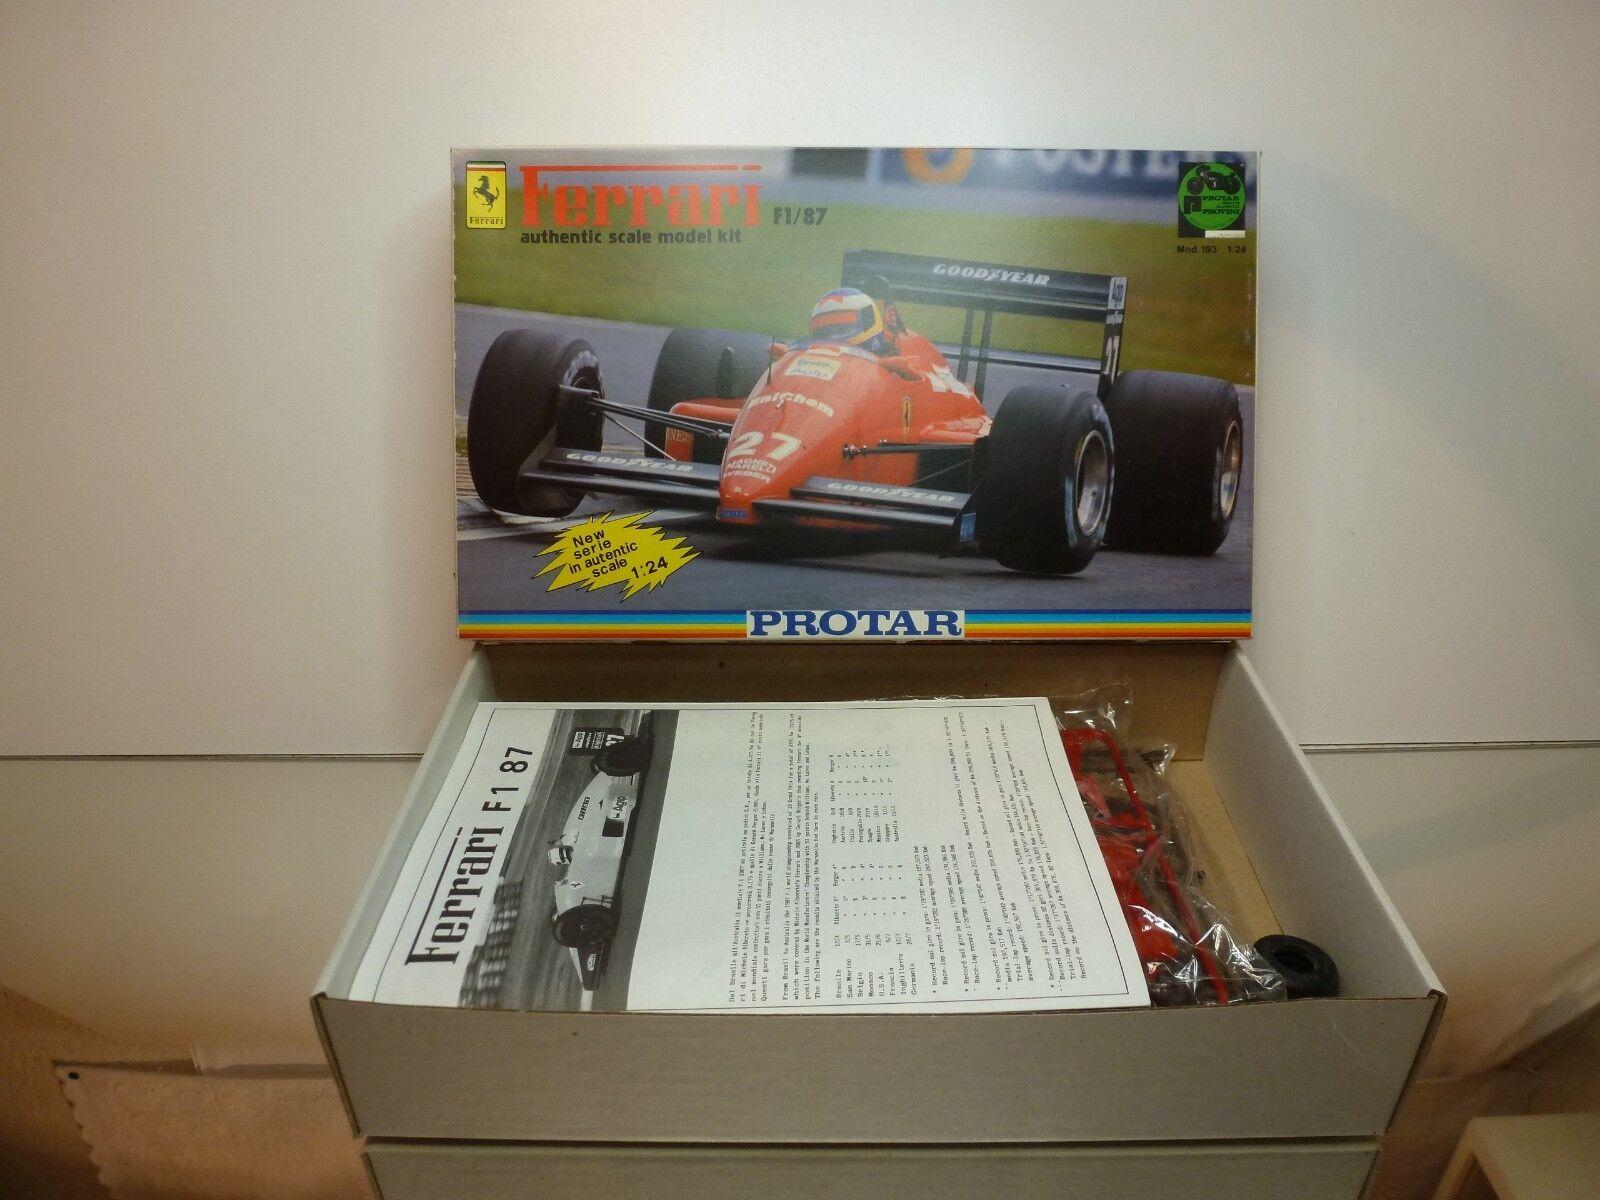 ProssoAR 193 KIT (unbuilt) FERRARI F1 87  27 or  28 - rosso 1 24 - UNBUILT IN BOX